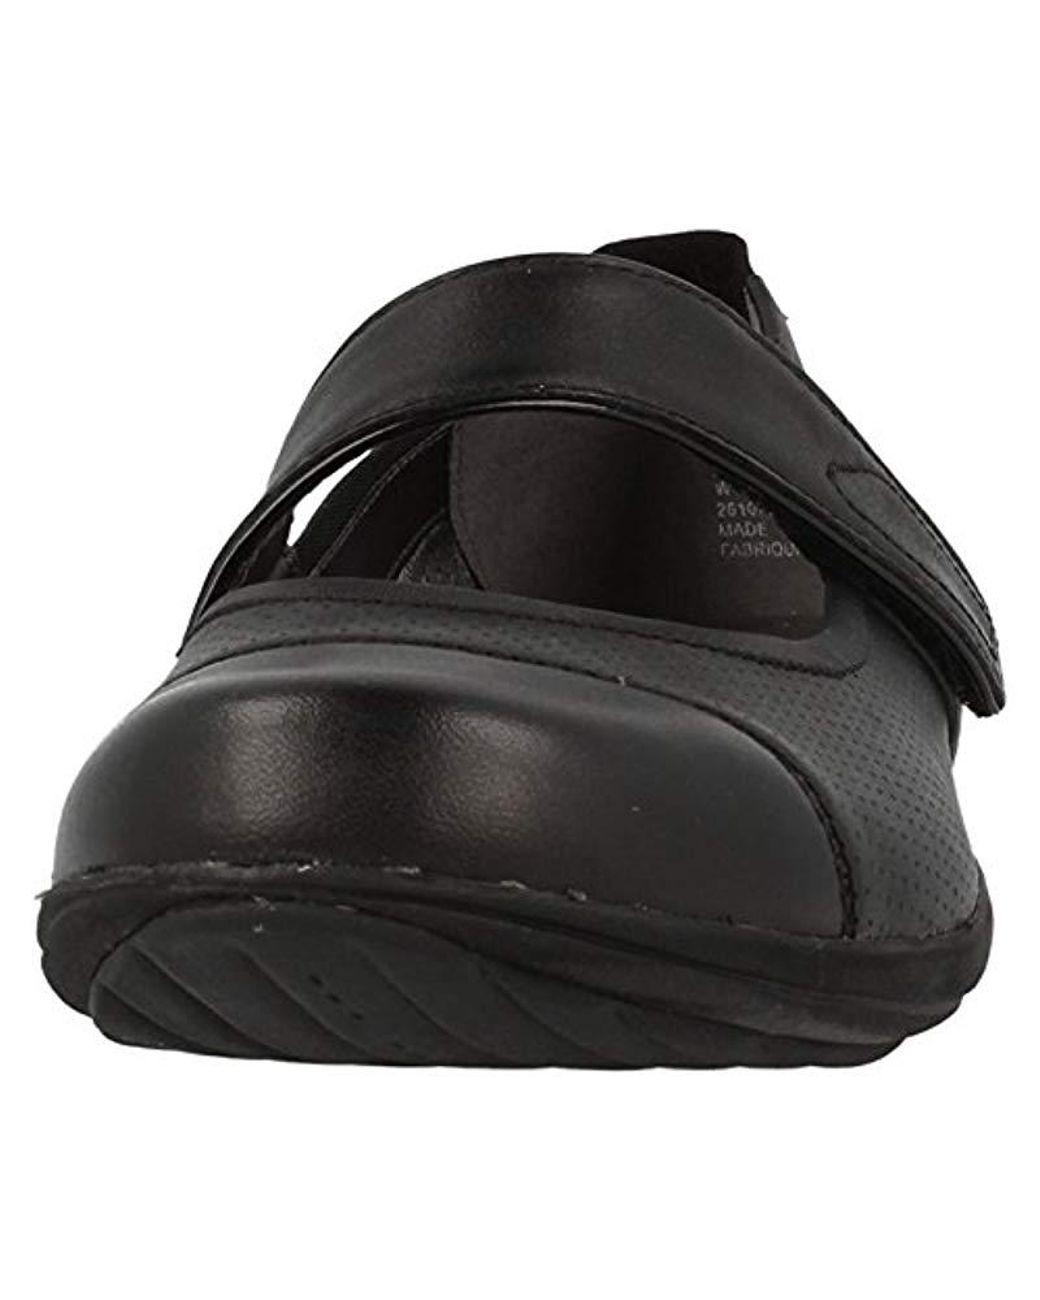 Clarks Ladies Shoes Indigo Charm